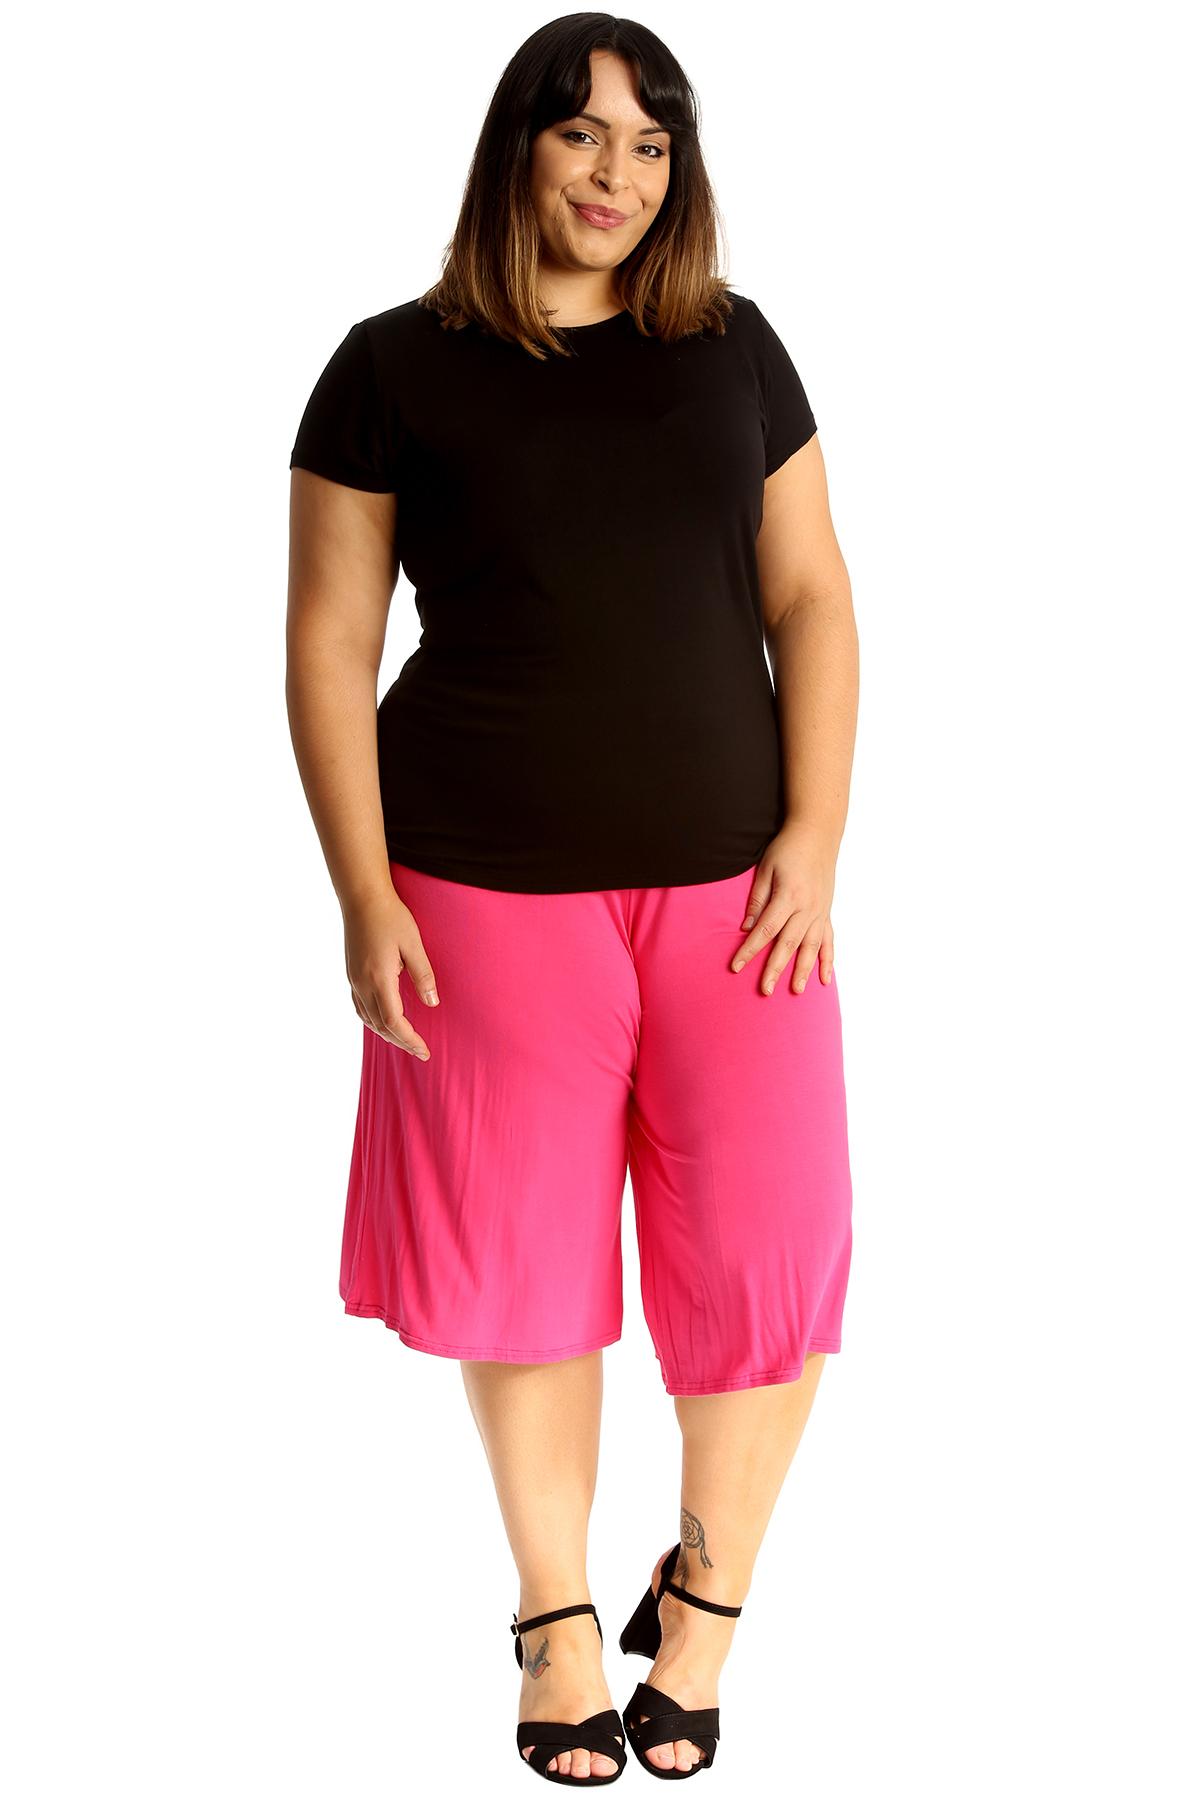 New-Womens-Plus-Size-Culottes-Ladies-Plain-Shorts-Palazzo-Elastic-Pants-Summer thumbnail 18